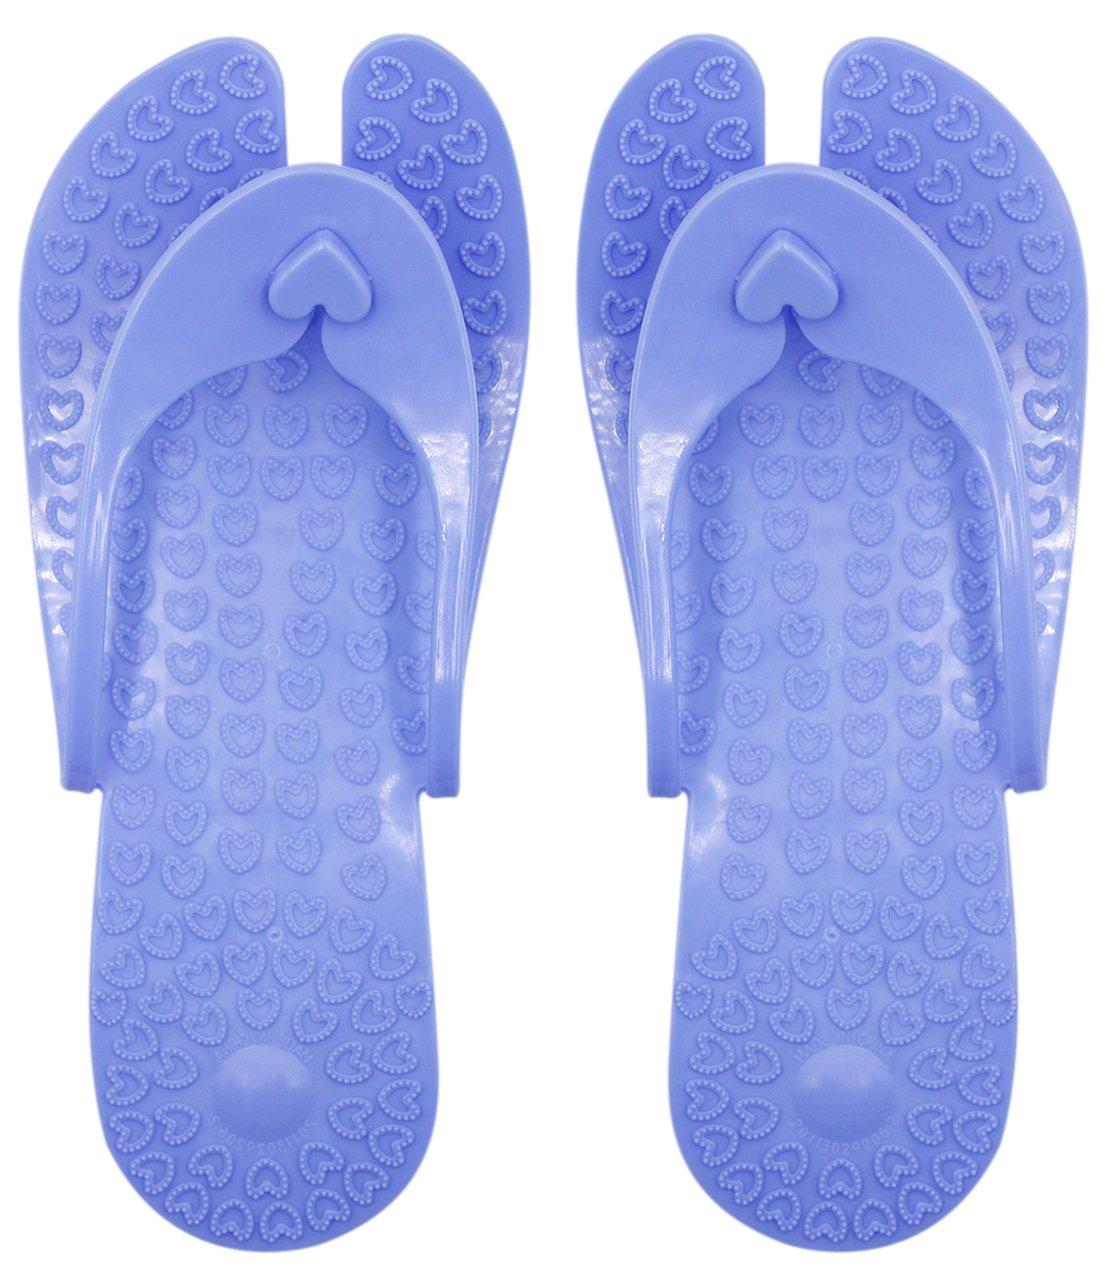 CC-US Portable & Foldable Foot Massage Slippers Non-Slip Flip-Flops Bathroom Shower Sandals for Travel Beach